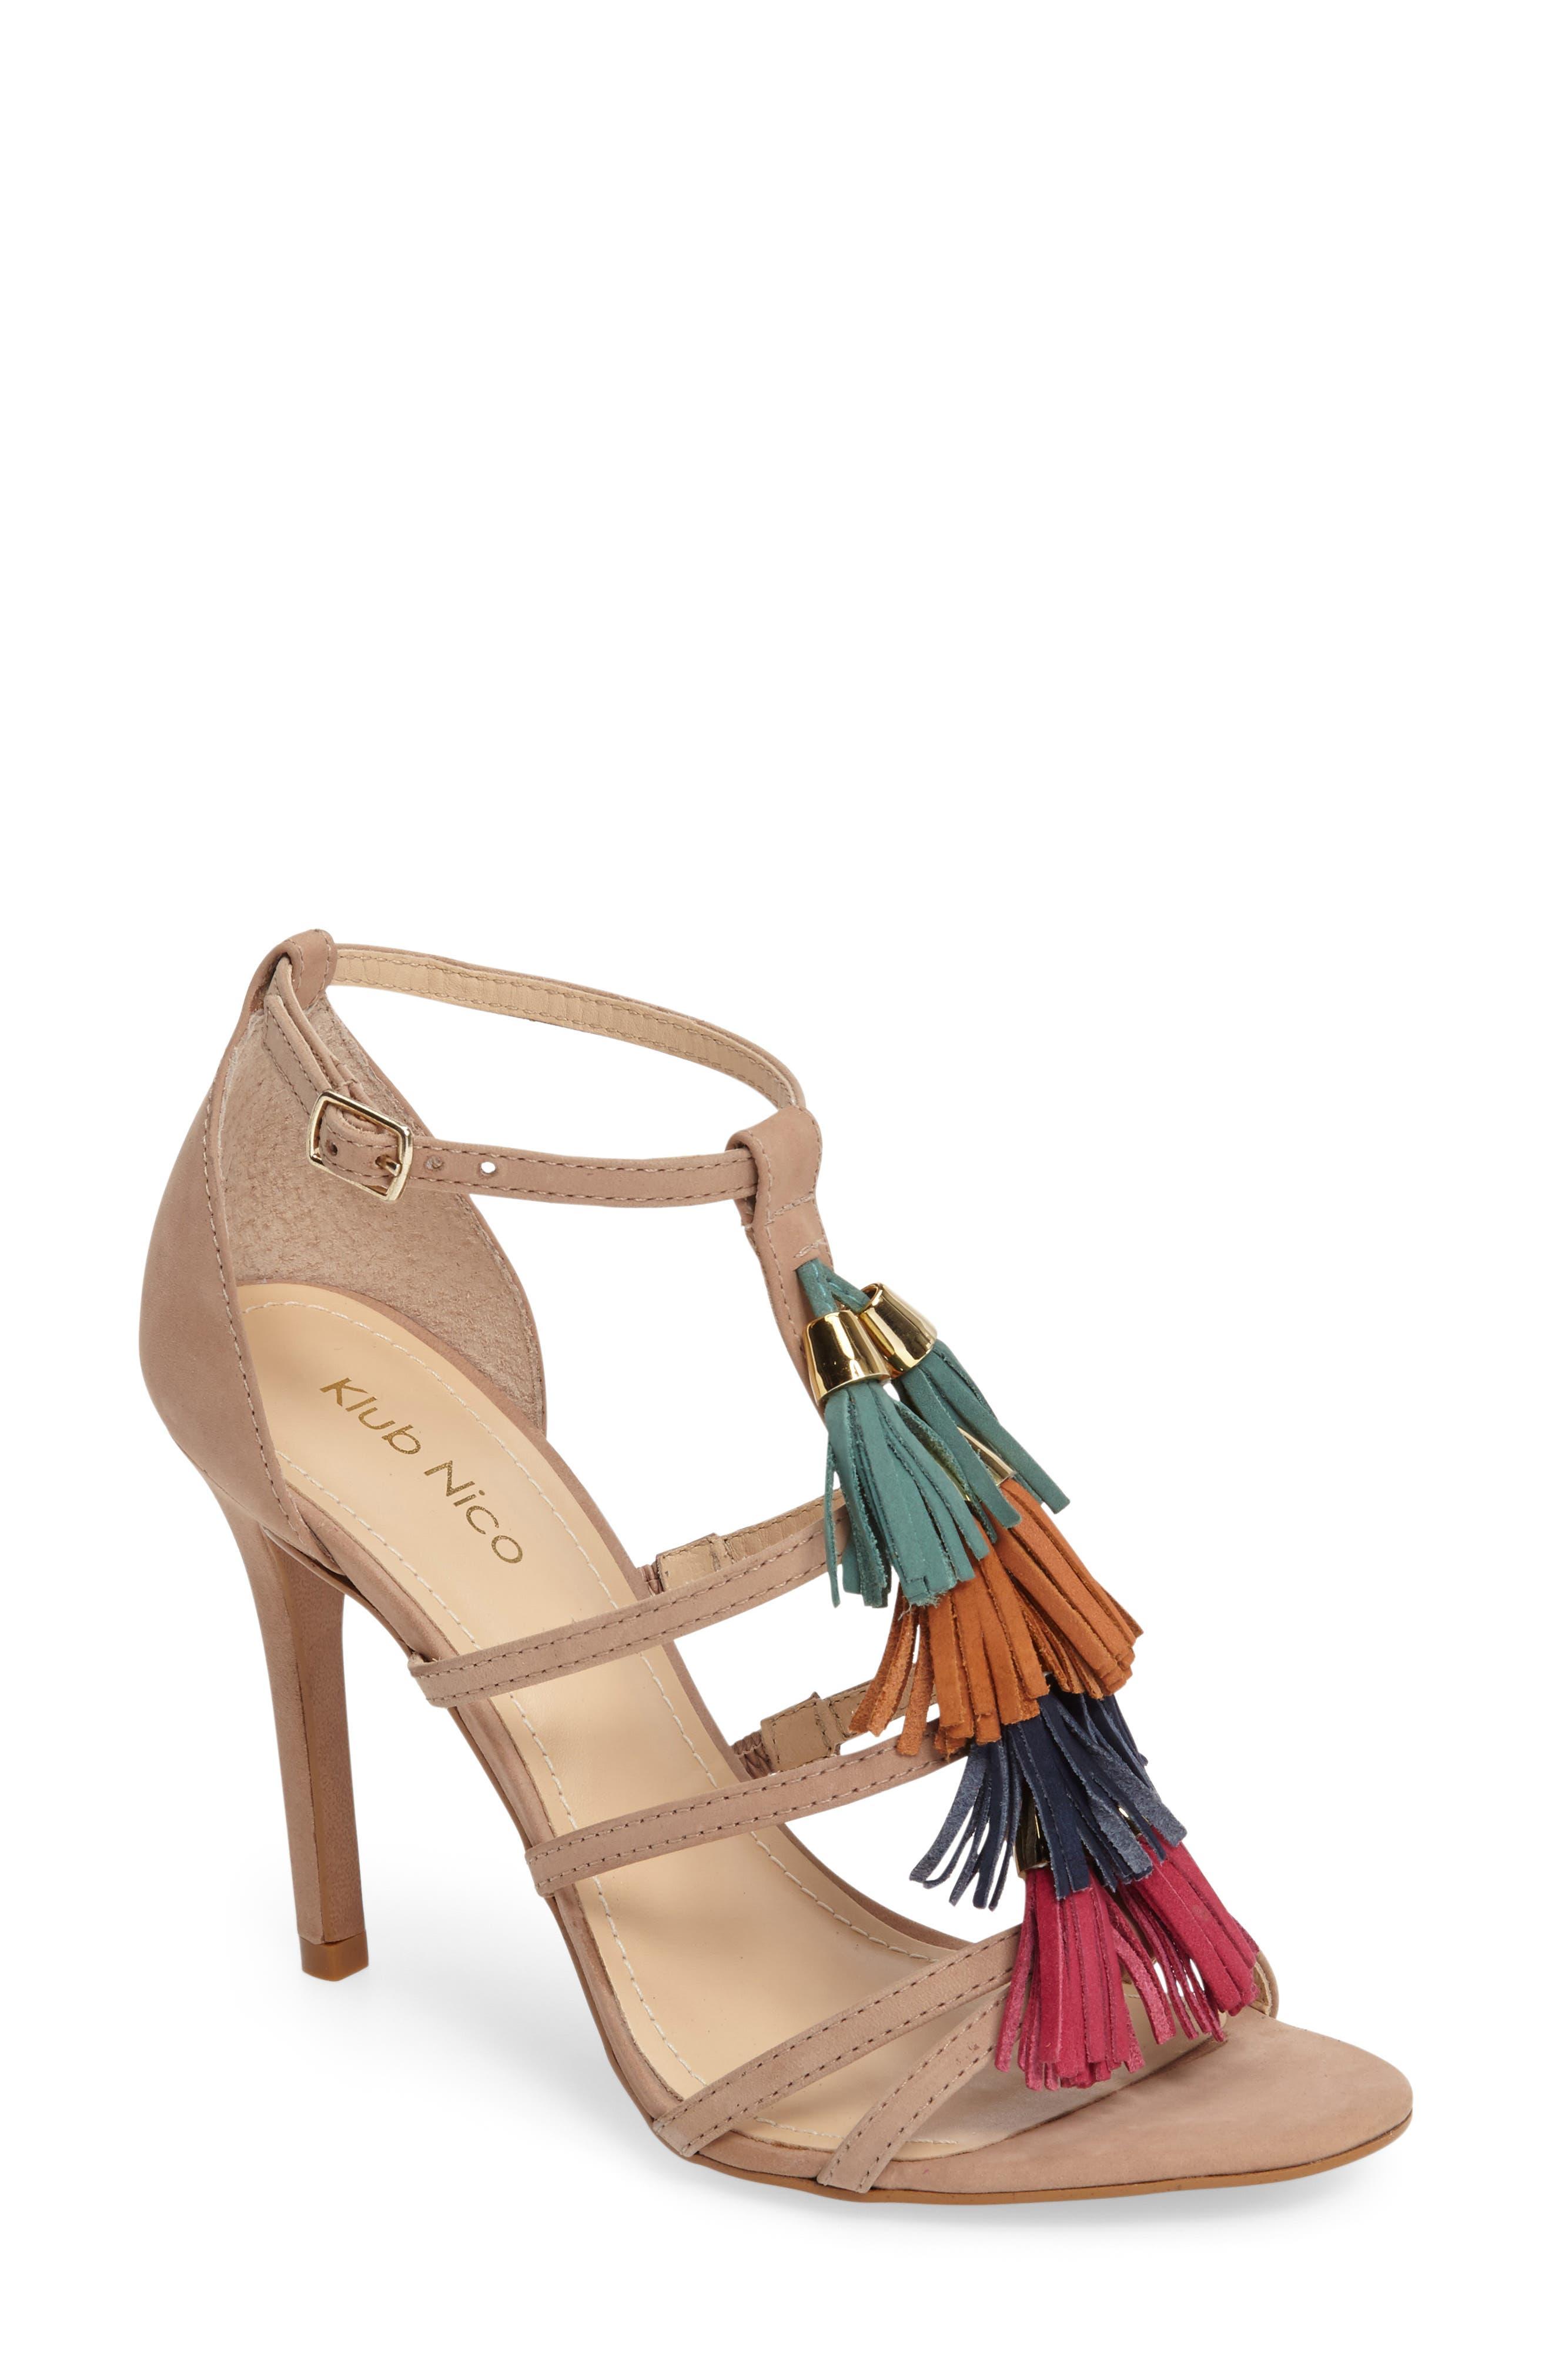 Main Image - Klub Nico Myra Tassel Sandal (Women)